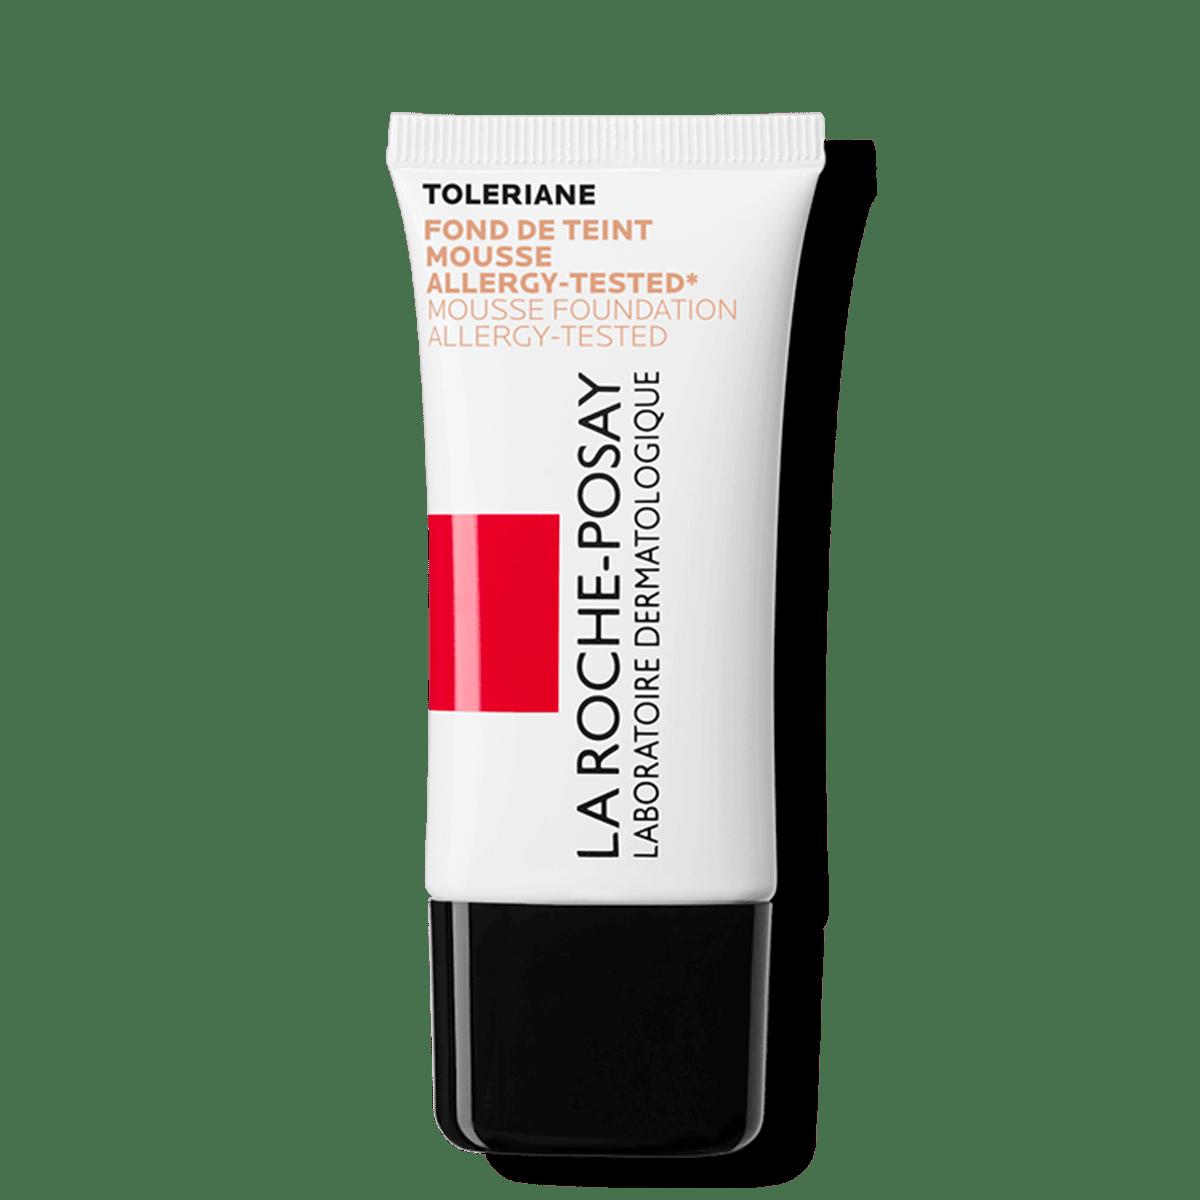 La Roche Posay Sensitive Toleriane Make up MOUSSE FOUNDATION